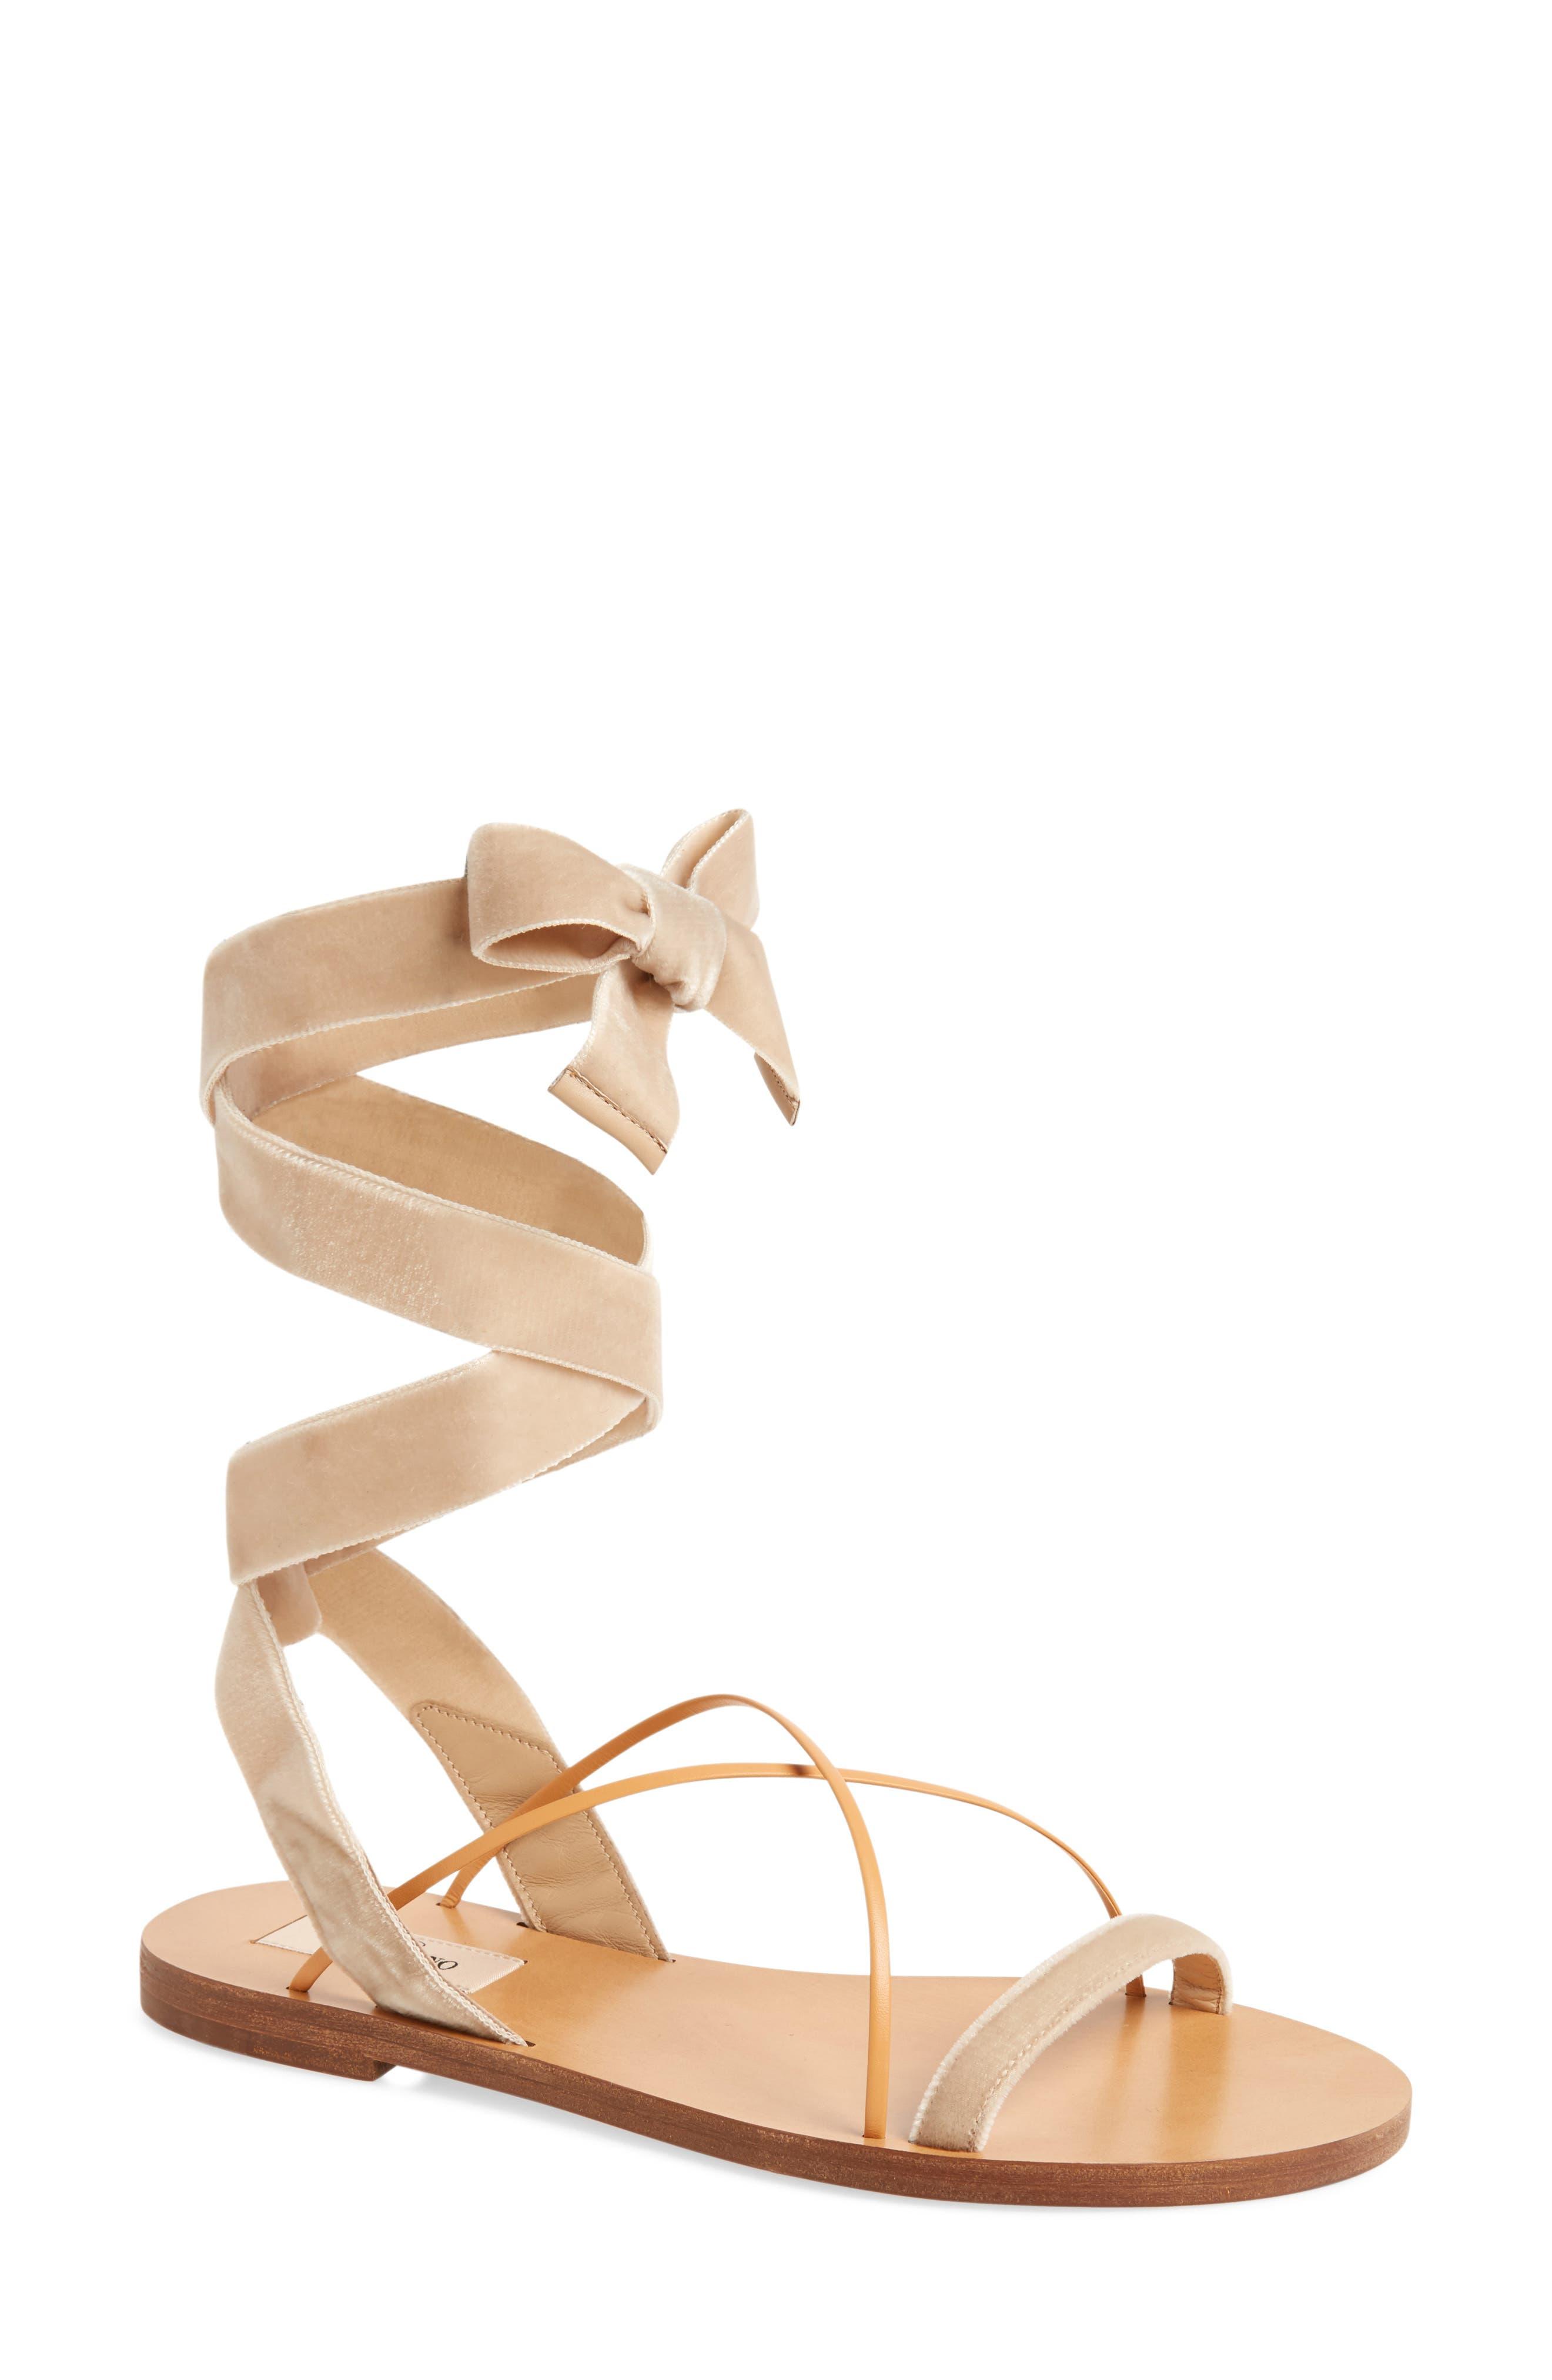 Alternate Image 1 Selected - Valentino Lace-up Sandal (Women)